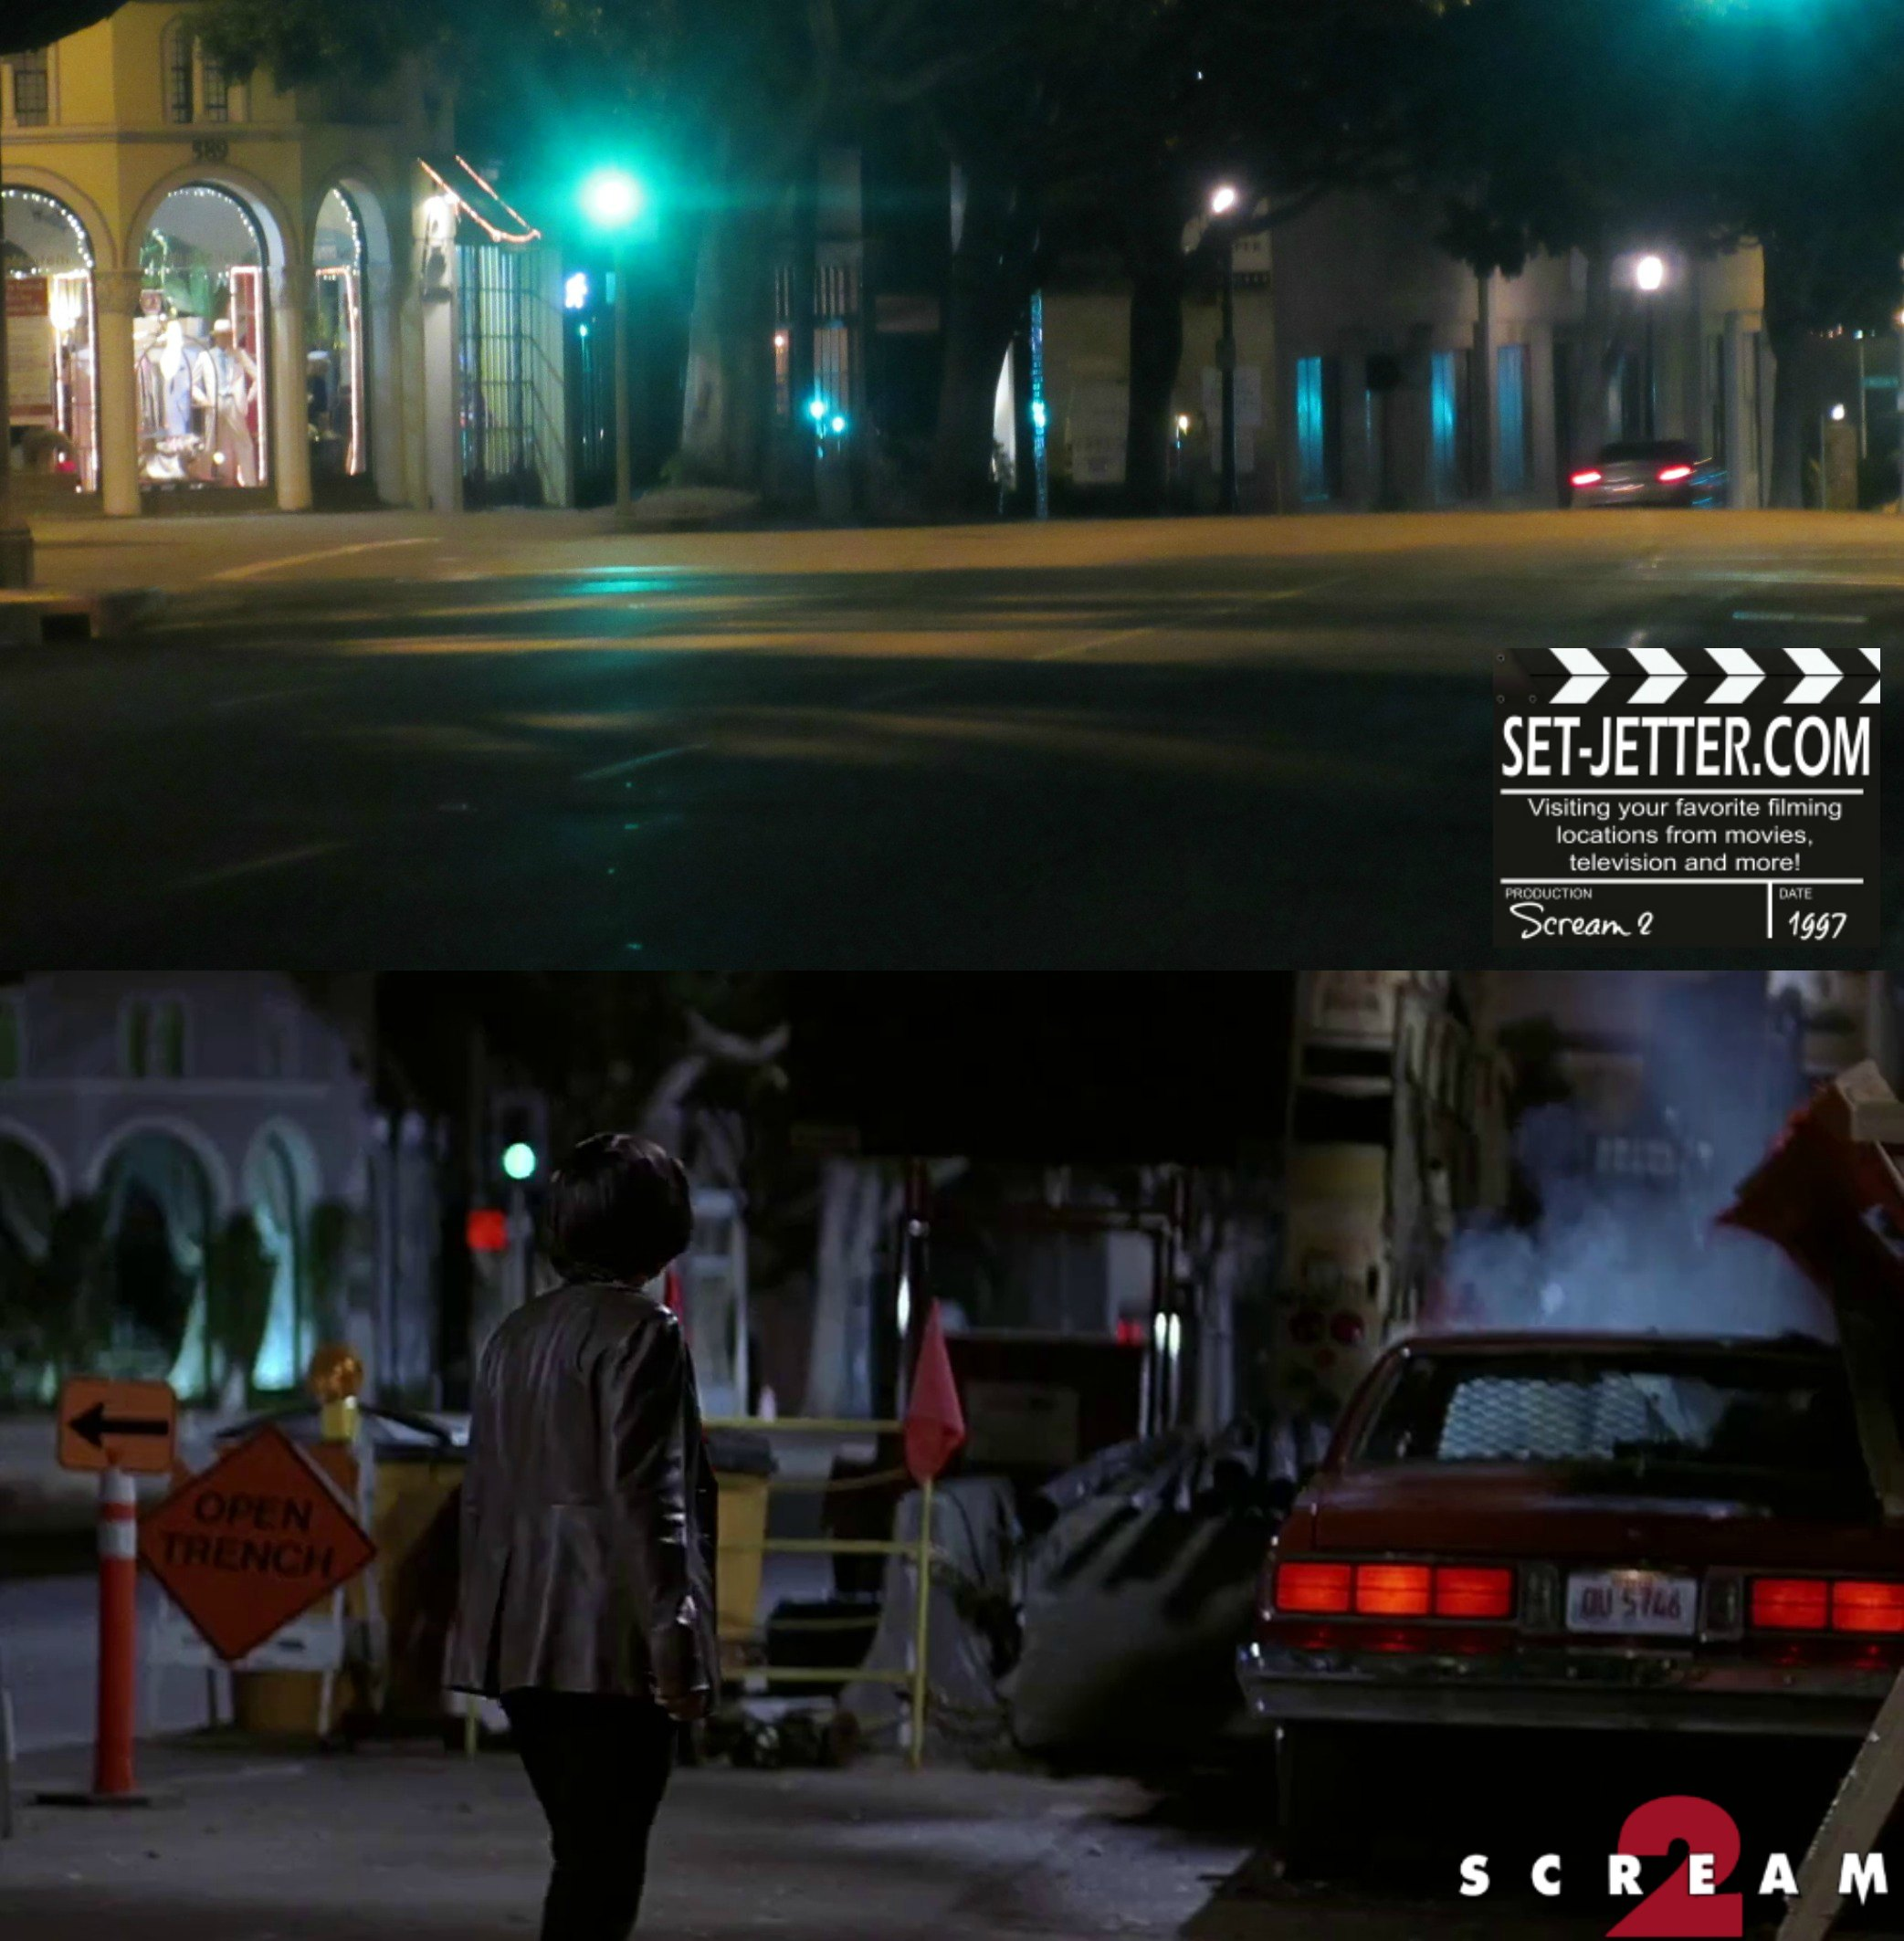 Scream 2 comparison 233.jpg